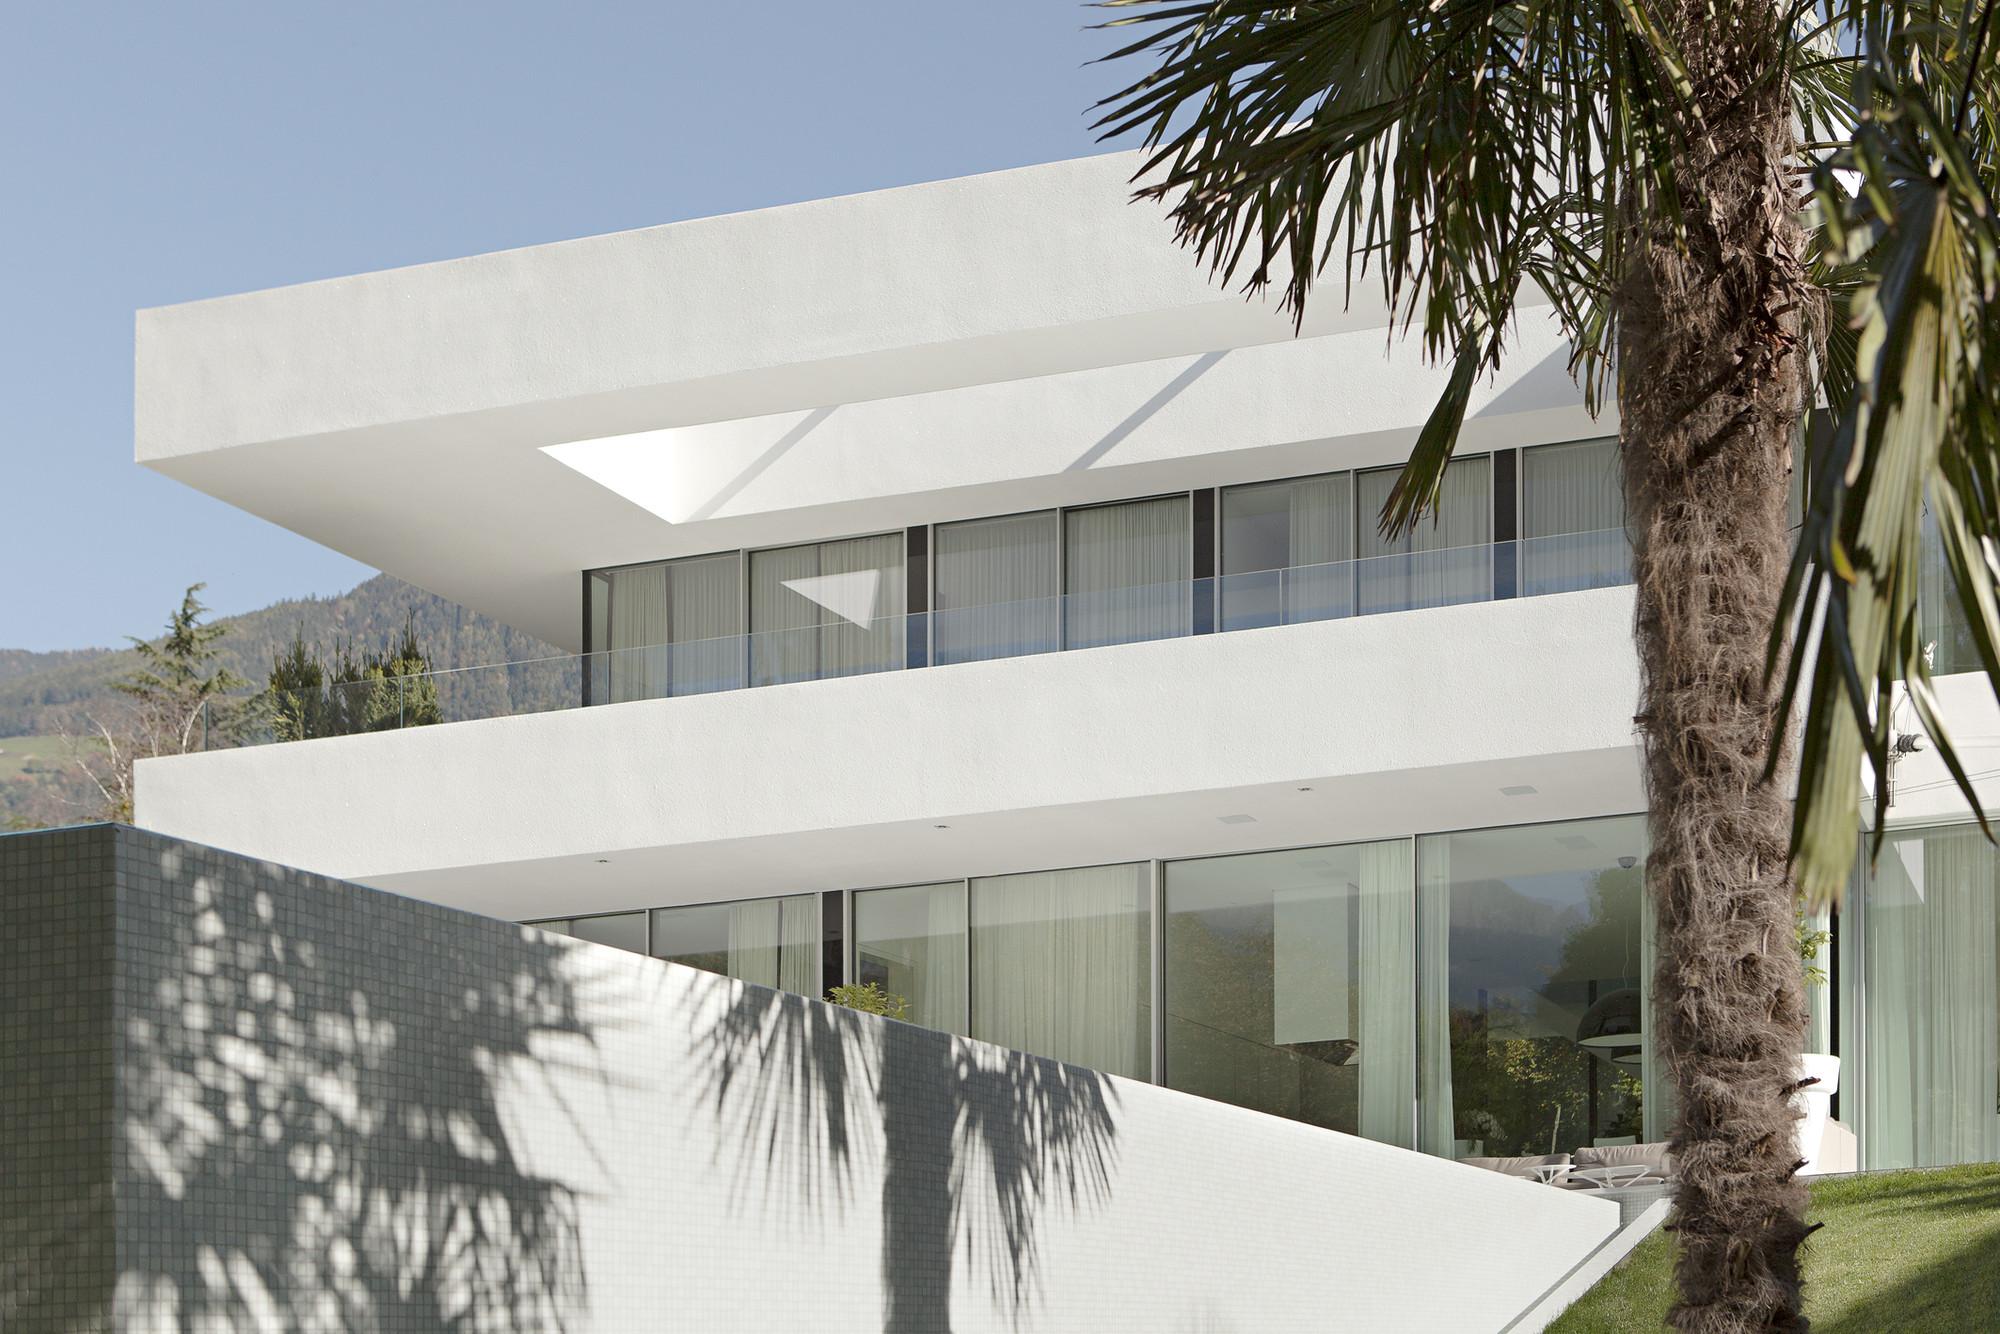 Galer a de casa m monovolume architecture design 36 - Pneu 3 50 8 ...